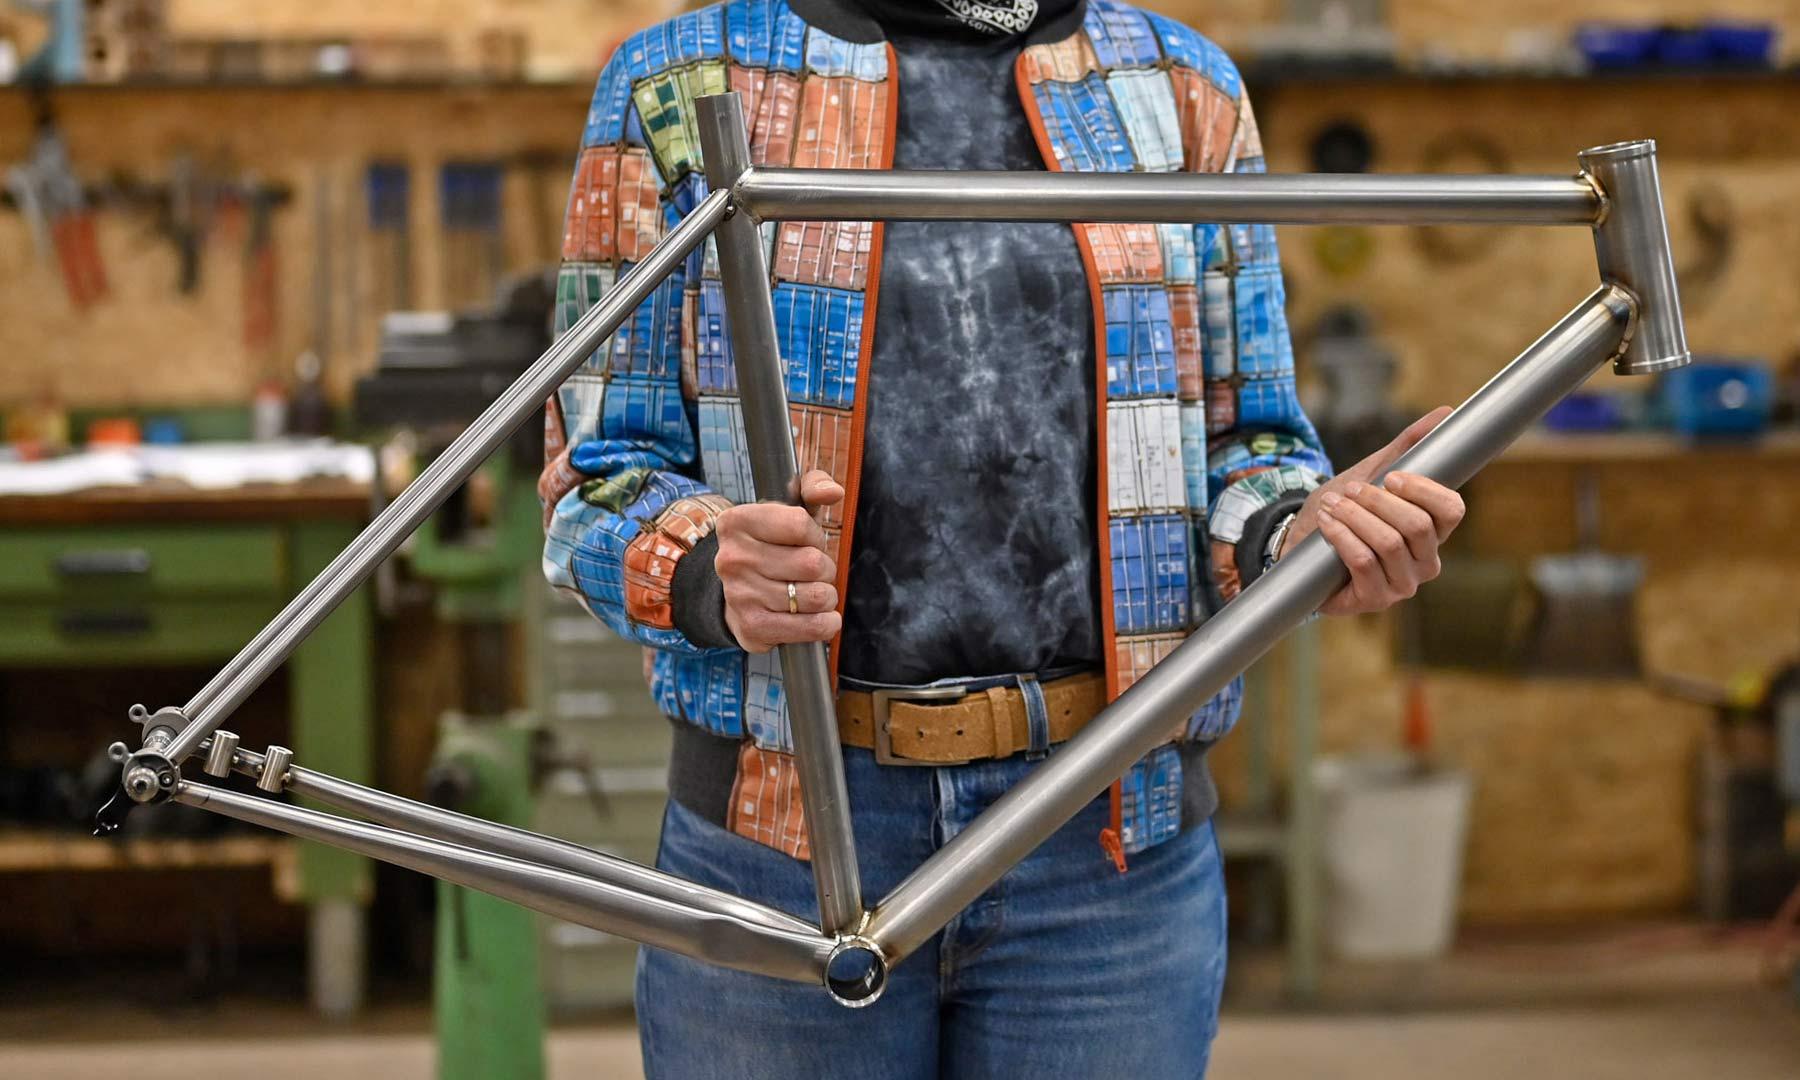 VSF Fahrradmanufaktur GX-1200 limited edition steel gravel bike, made-in-Germany, Johanna Jahnkeraw frame